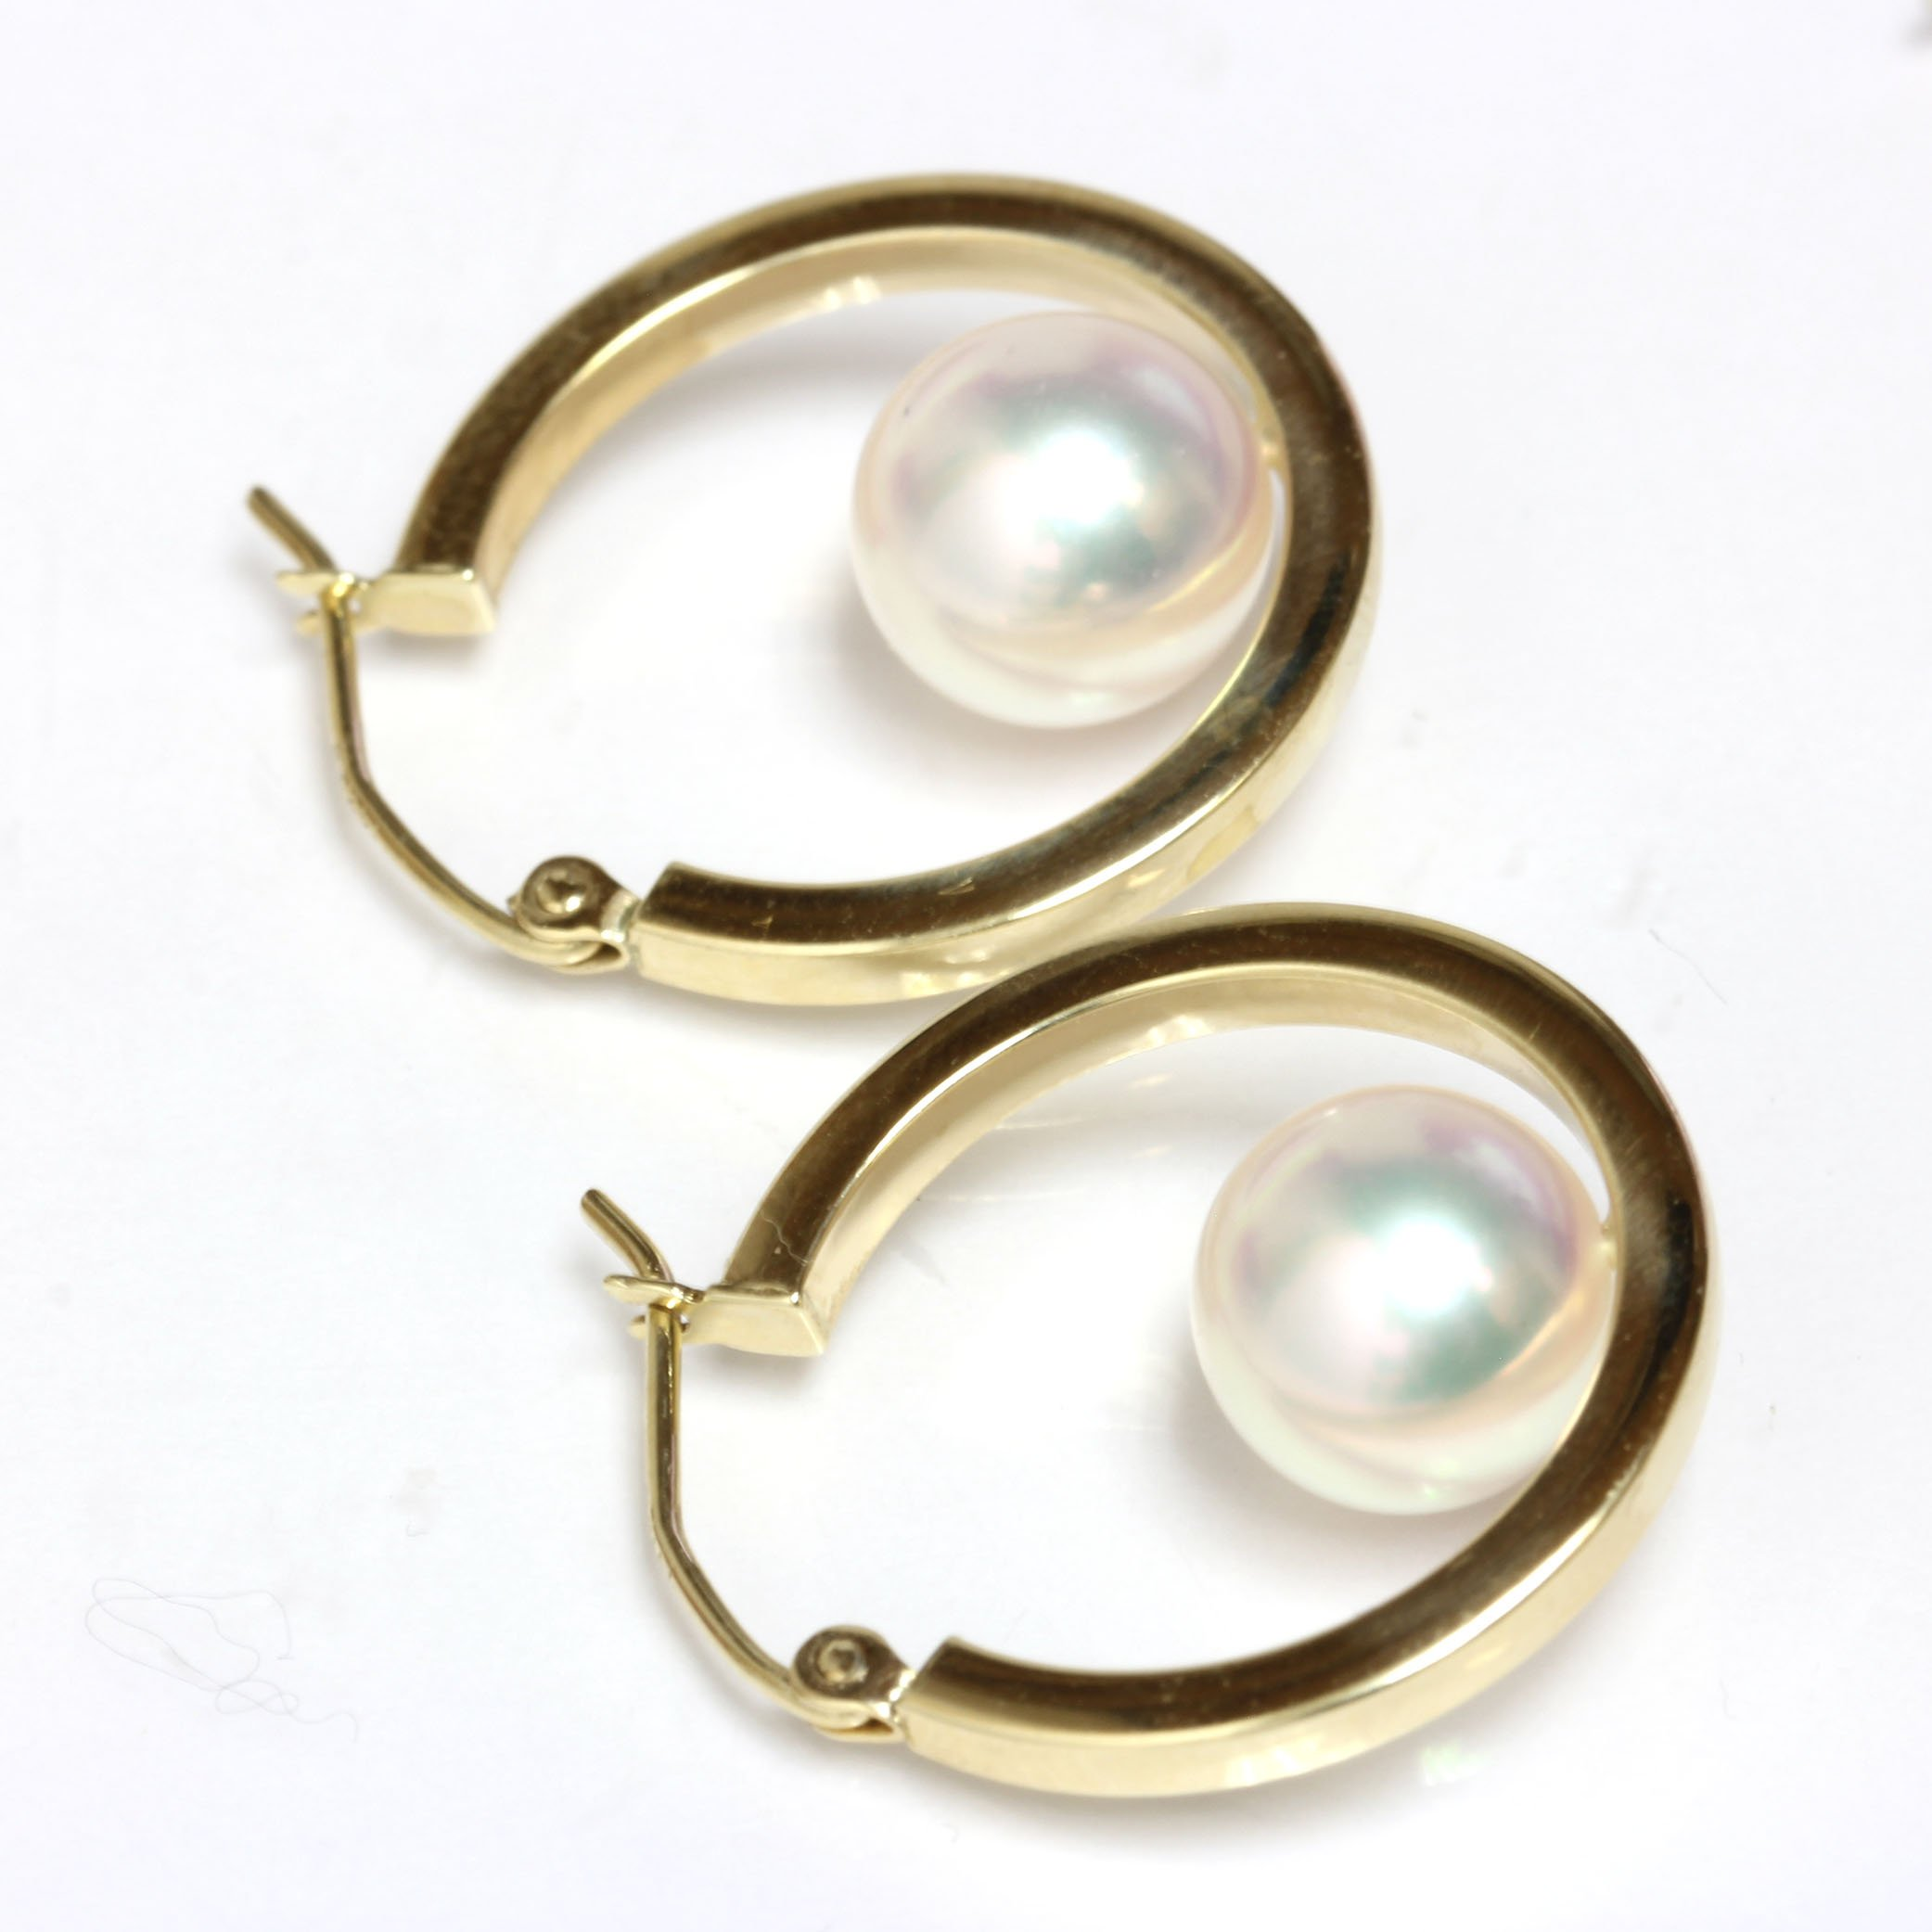 14k Yellow Gold Cultured Saltwater Akoya Pearl Dangle Hoop earrings - AAA and AAA Flawless (7.0-7.5mm AAA) by Seven Seas Pearls (Image #2)